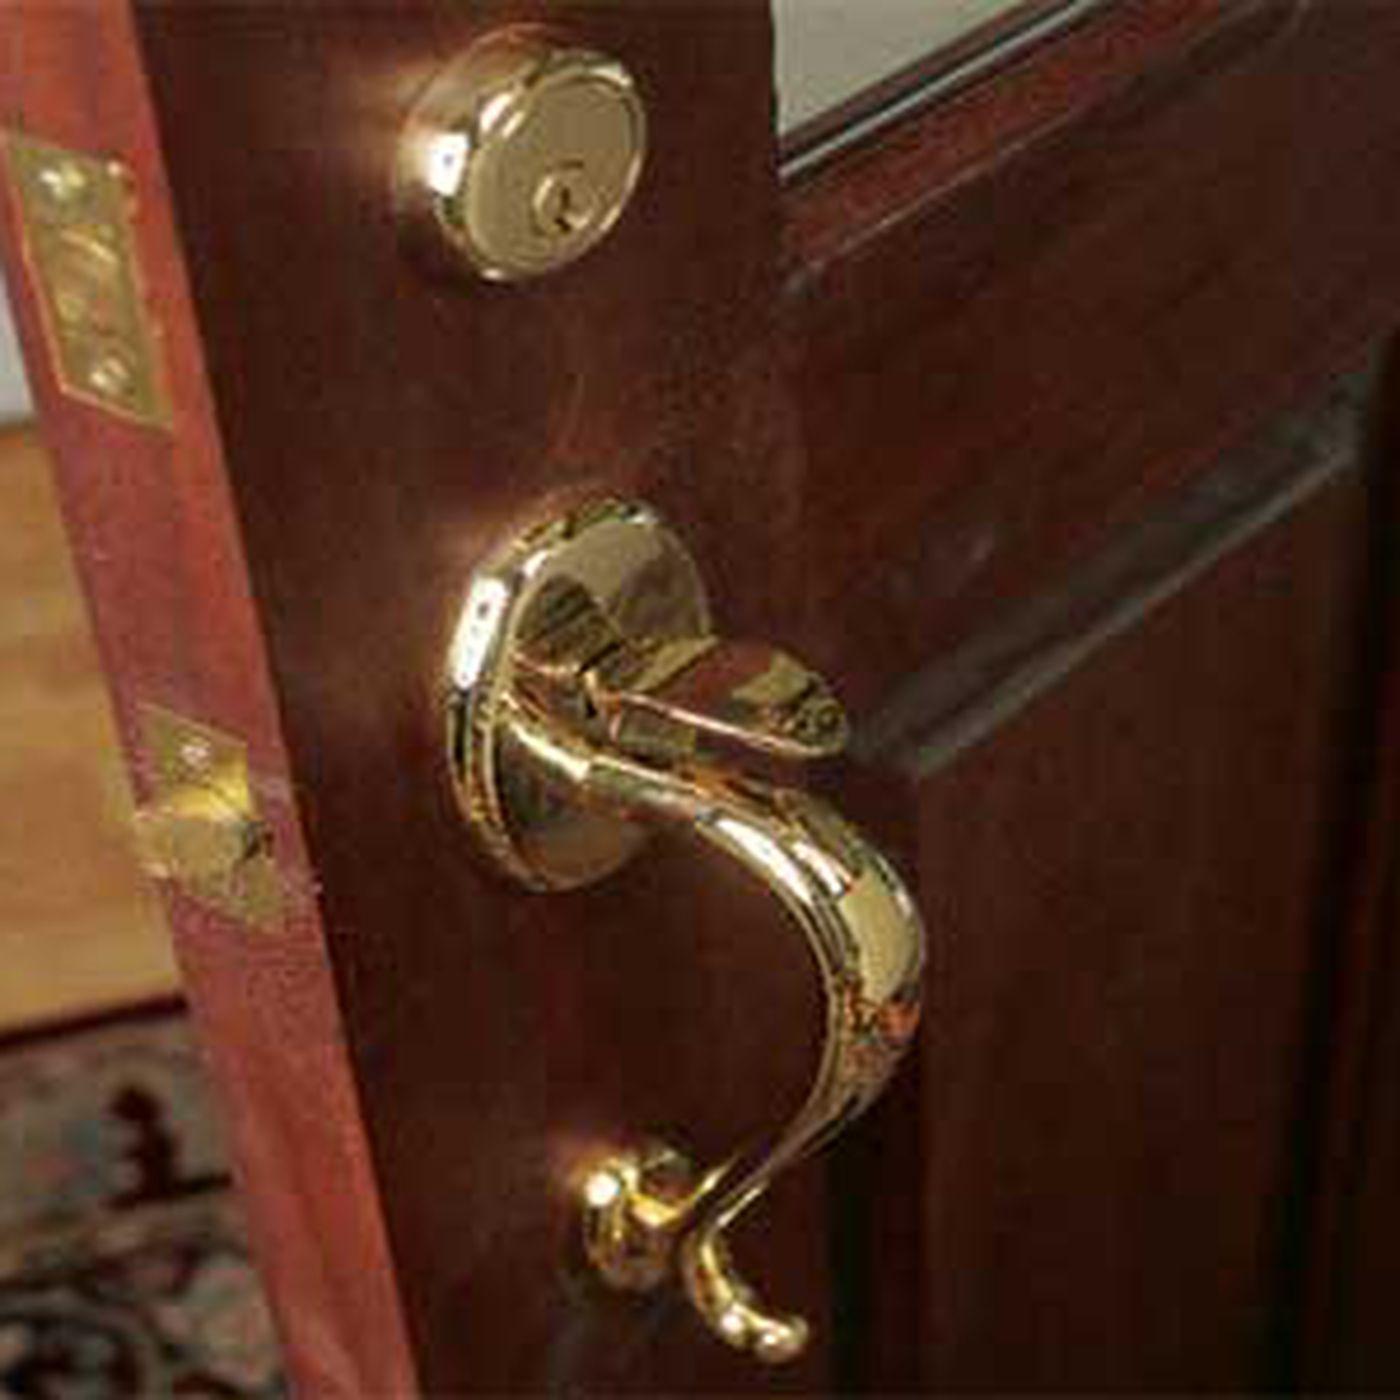 Furniture Lock Economy Flush Mount Lock Set Brass Plated Antique Style